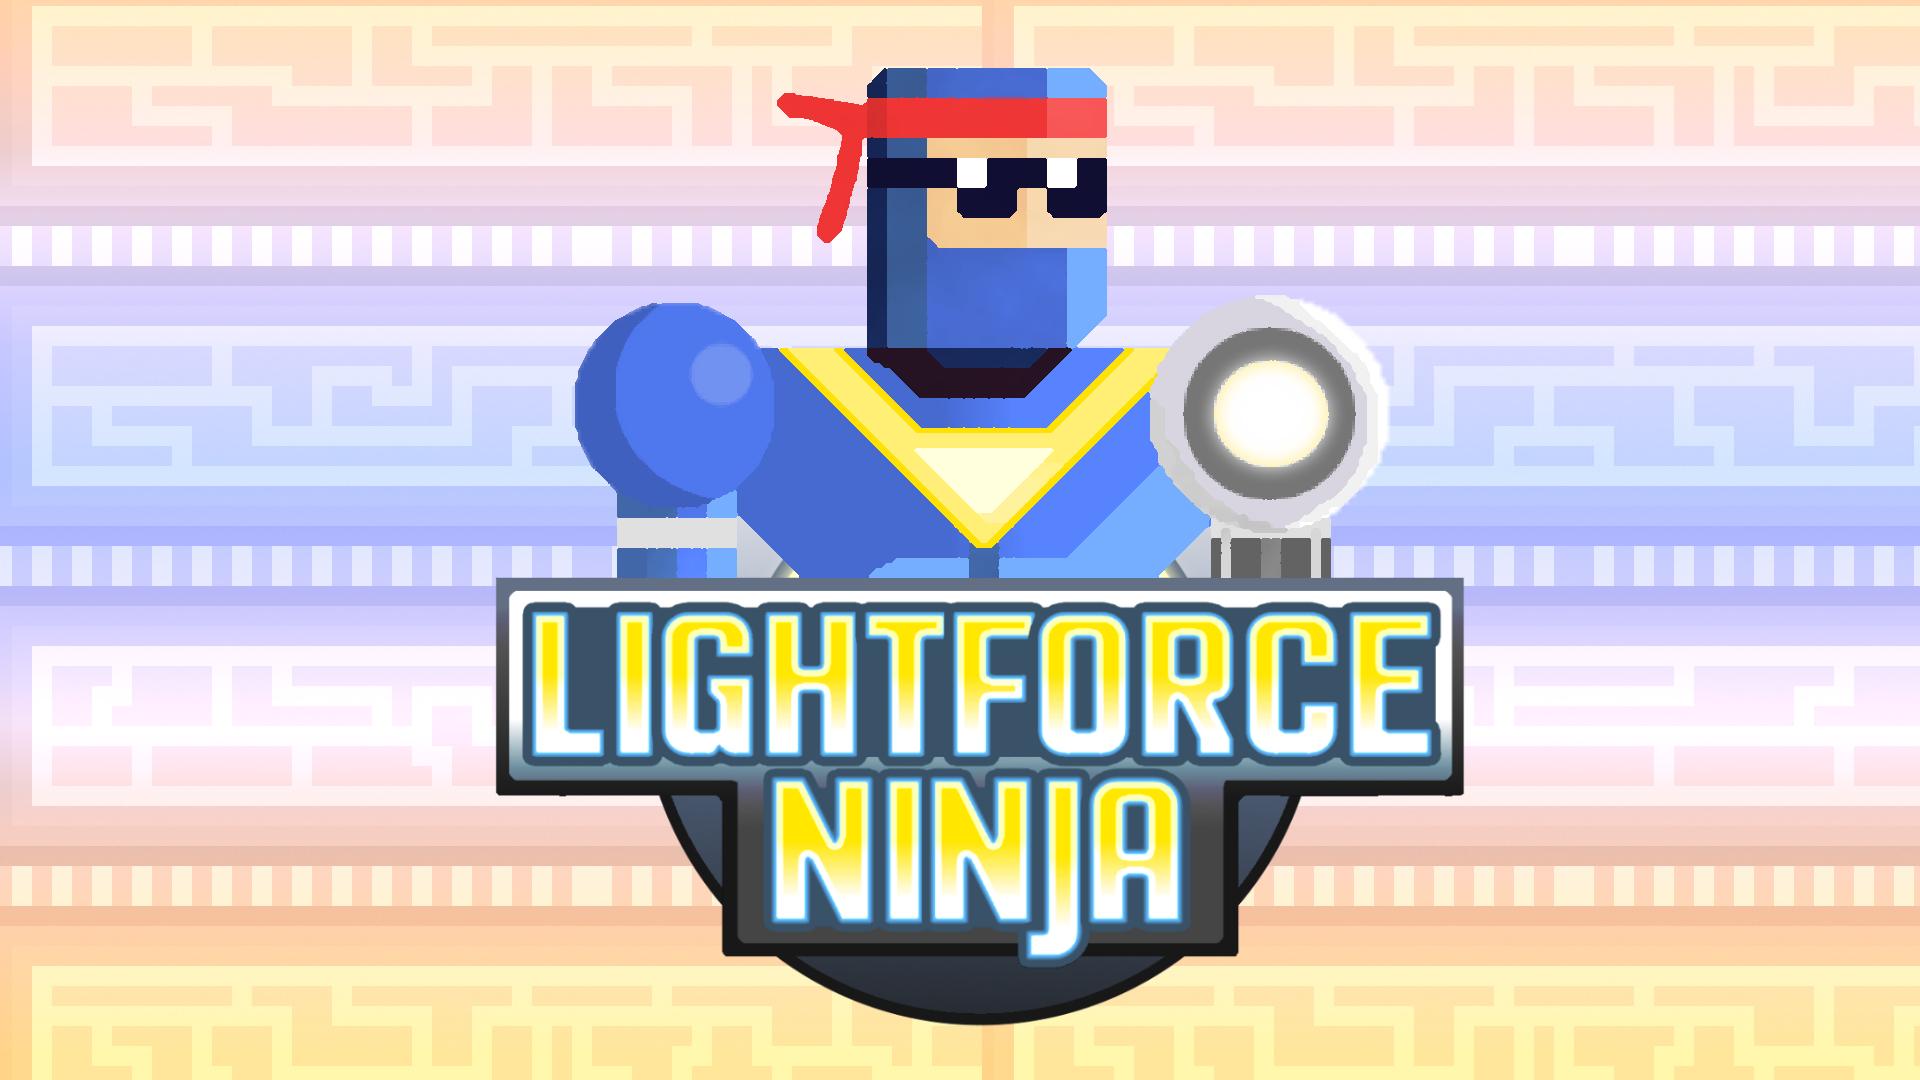 LIGHTFORCE NINJA (Windows PC) gratis auf itch.io